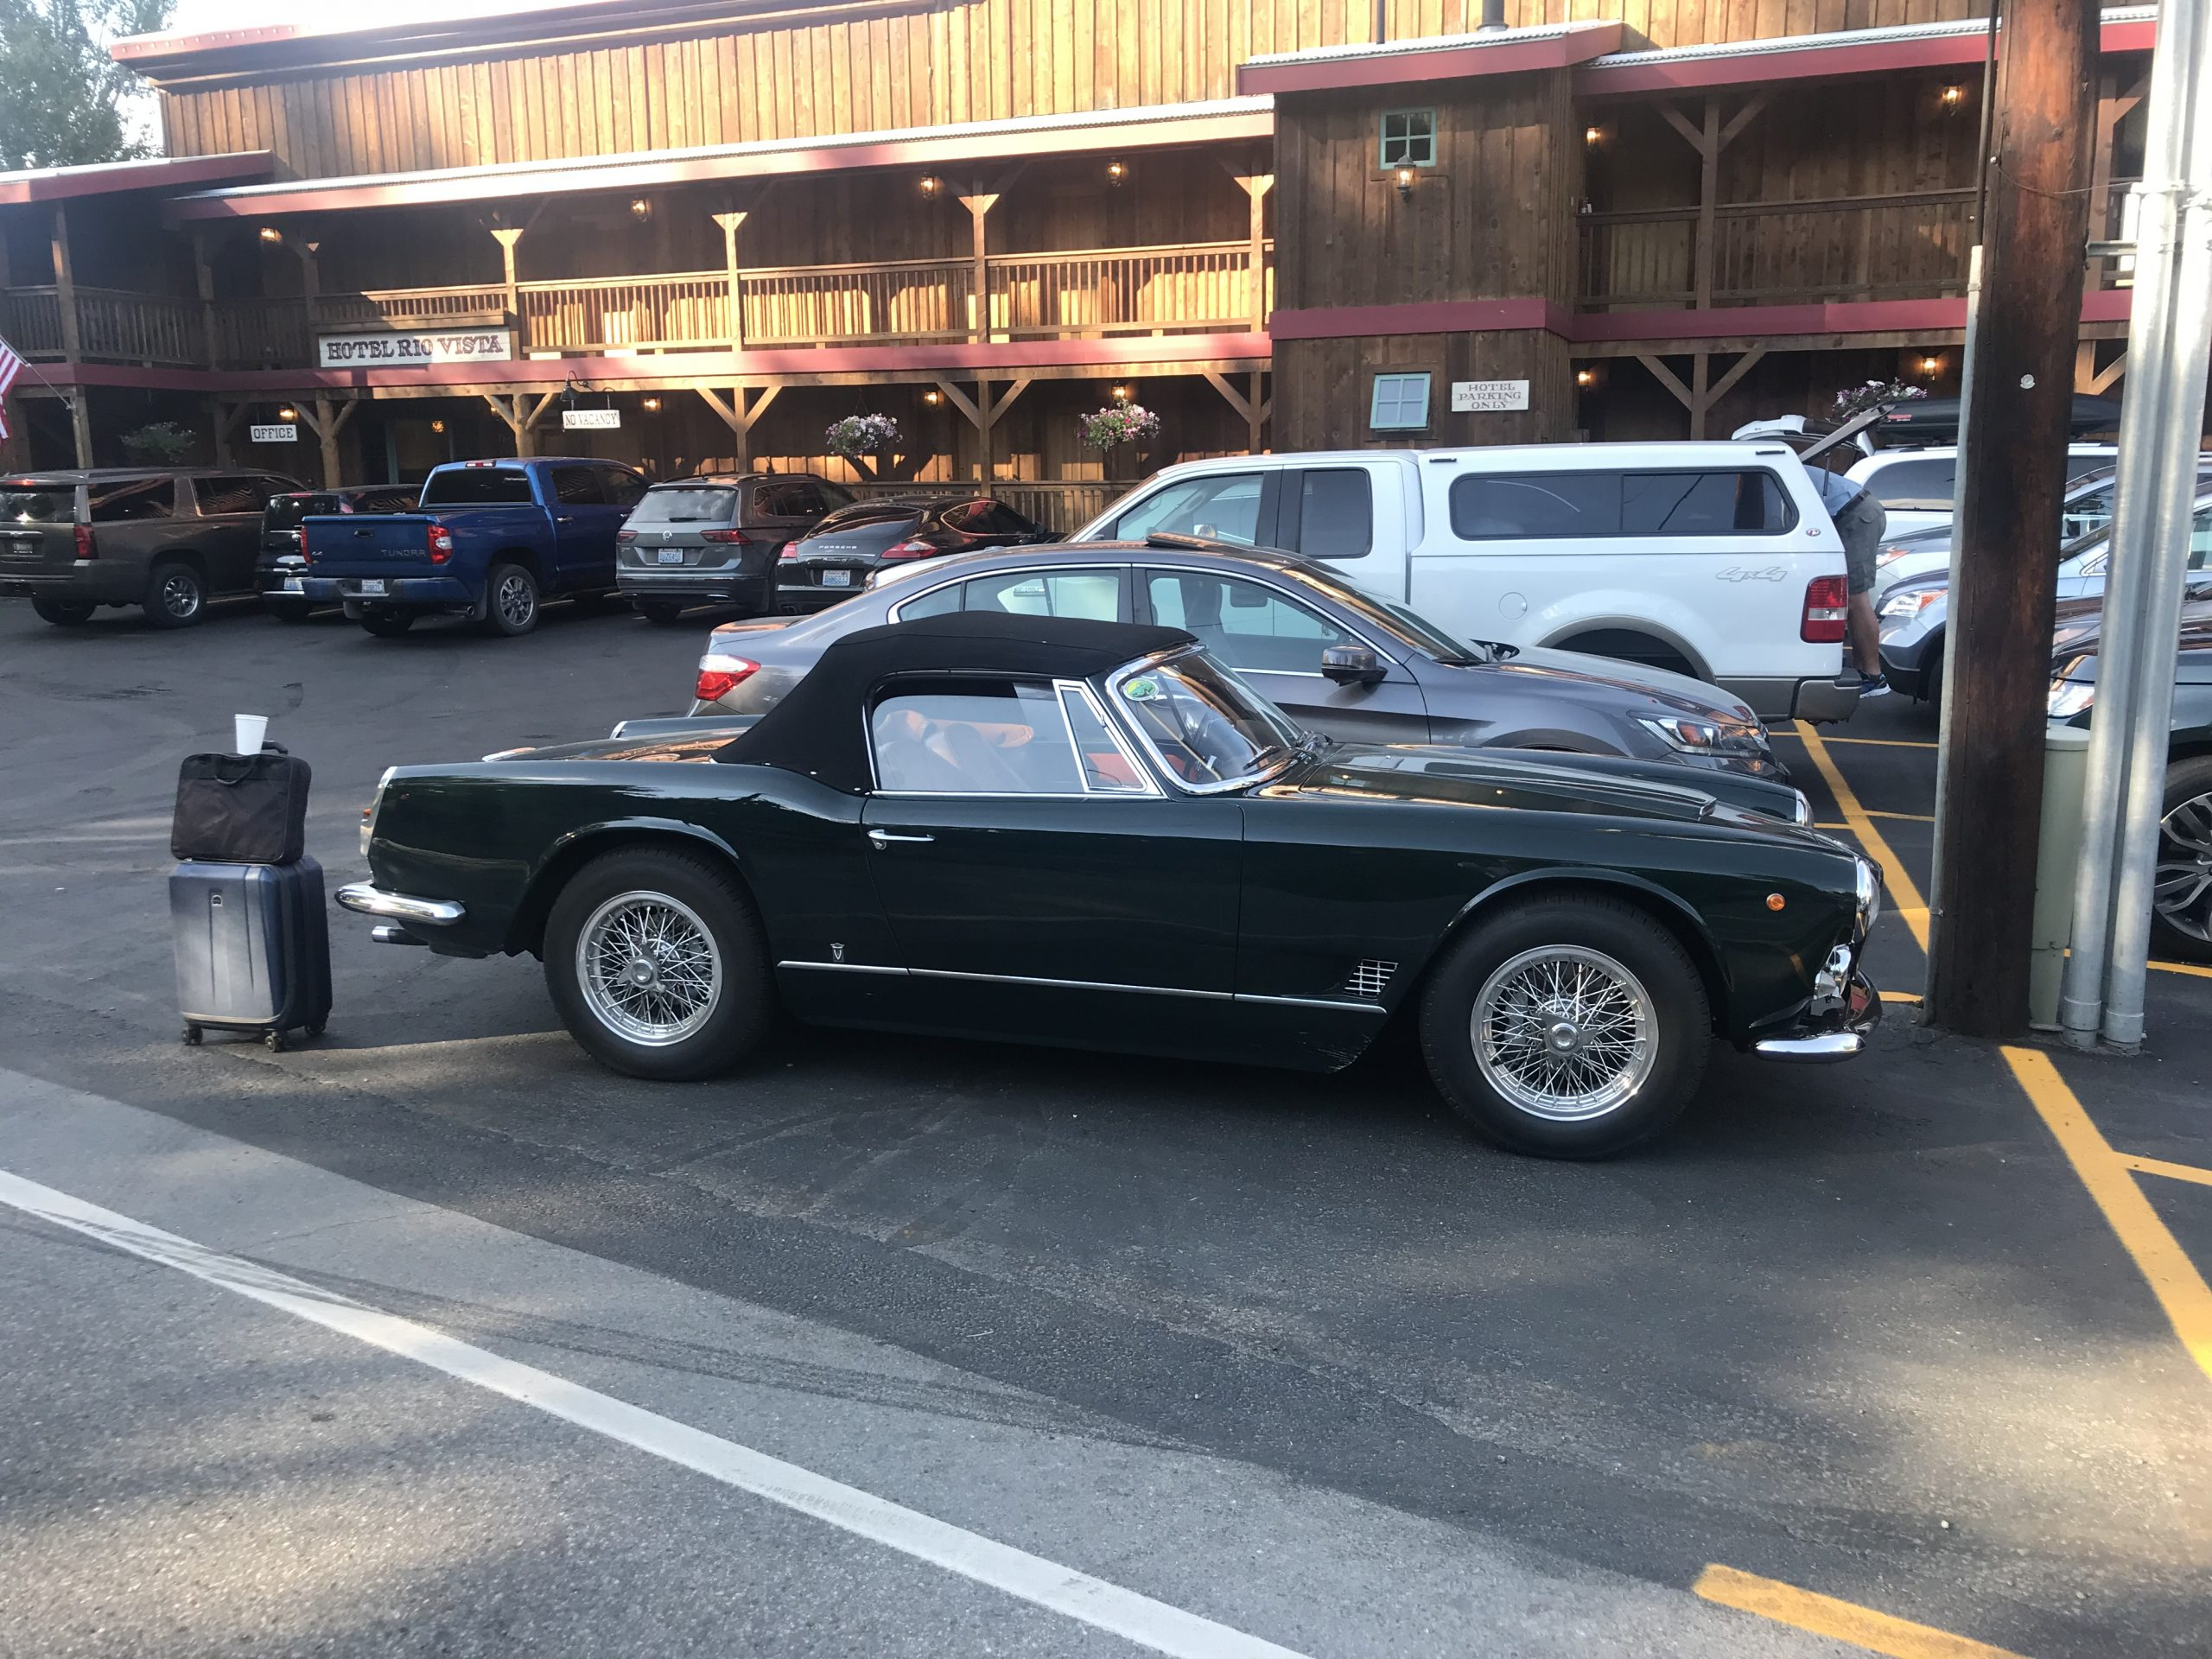 vintage maserati vignale spyder in hotel rio vista parking lot